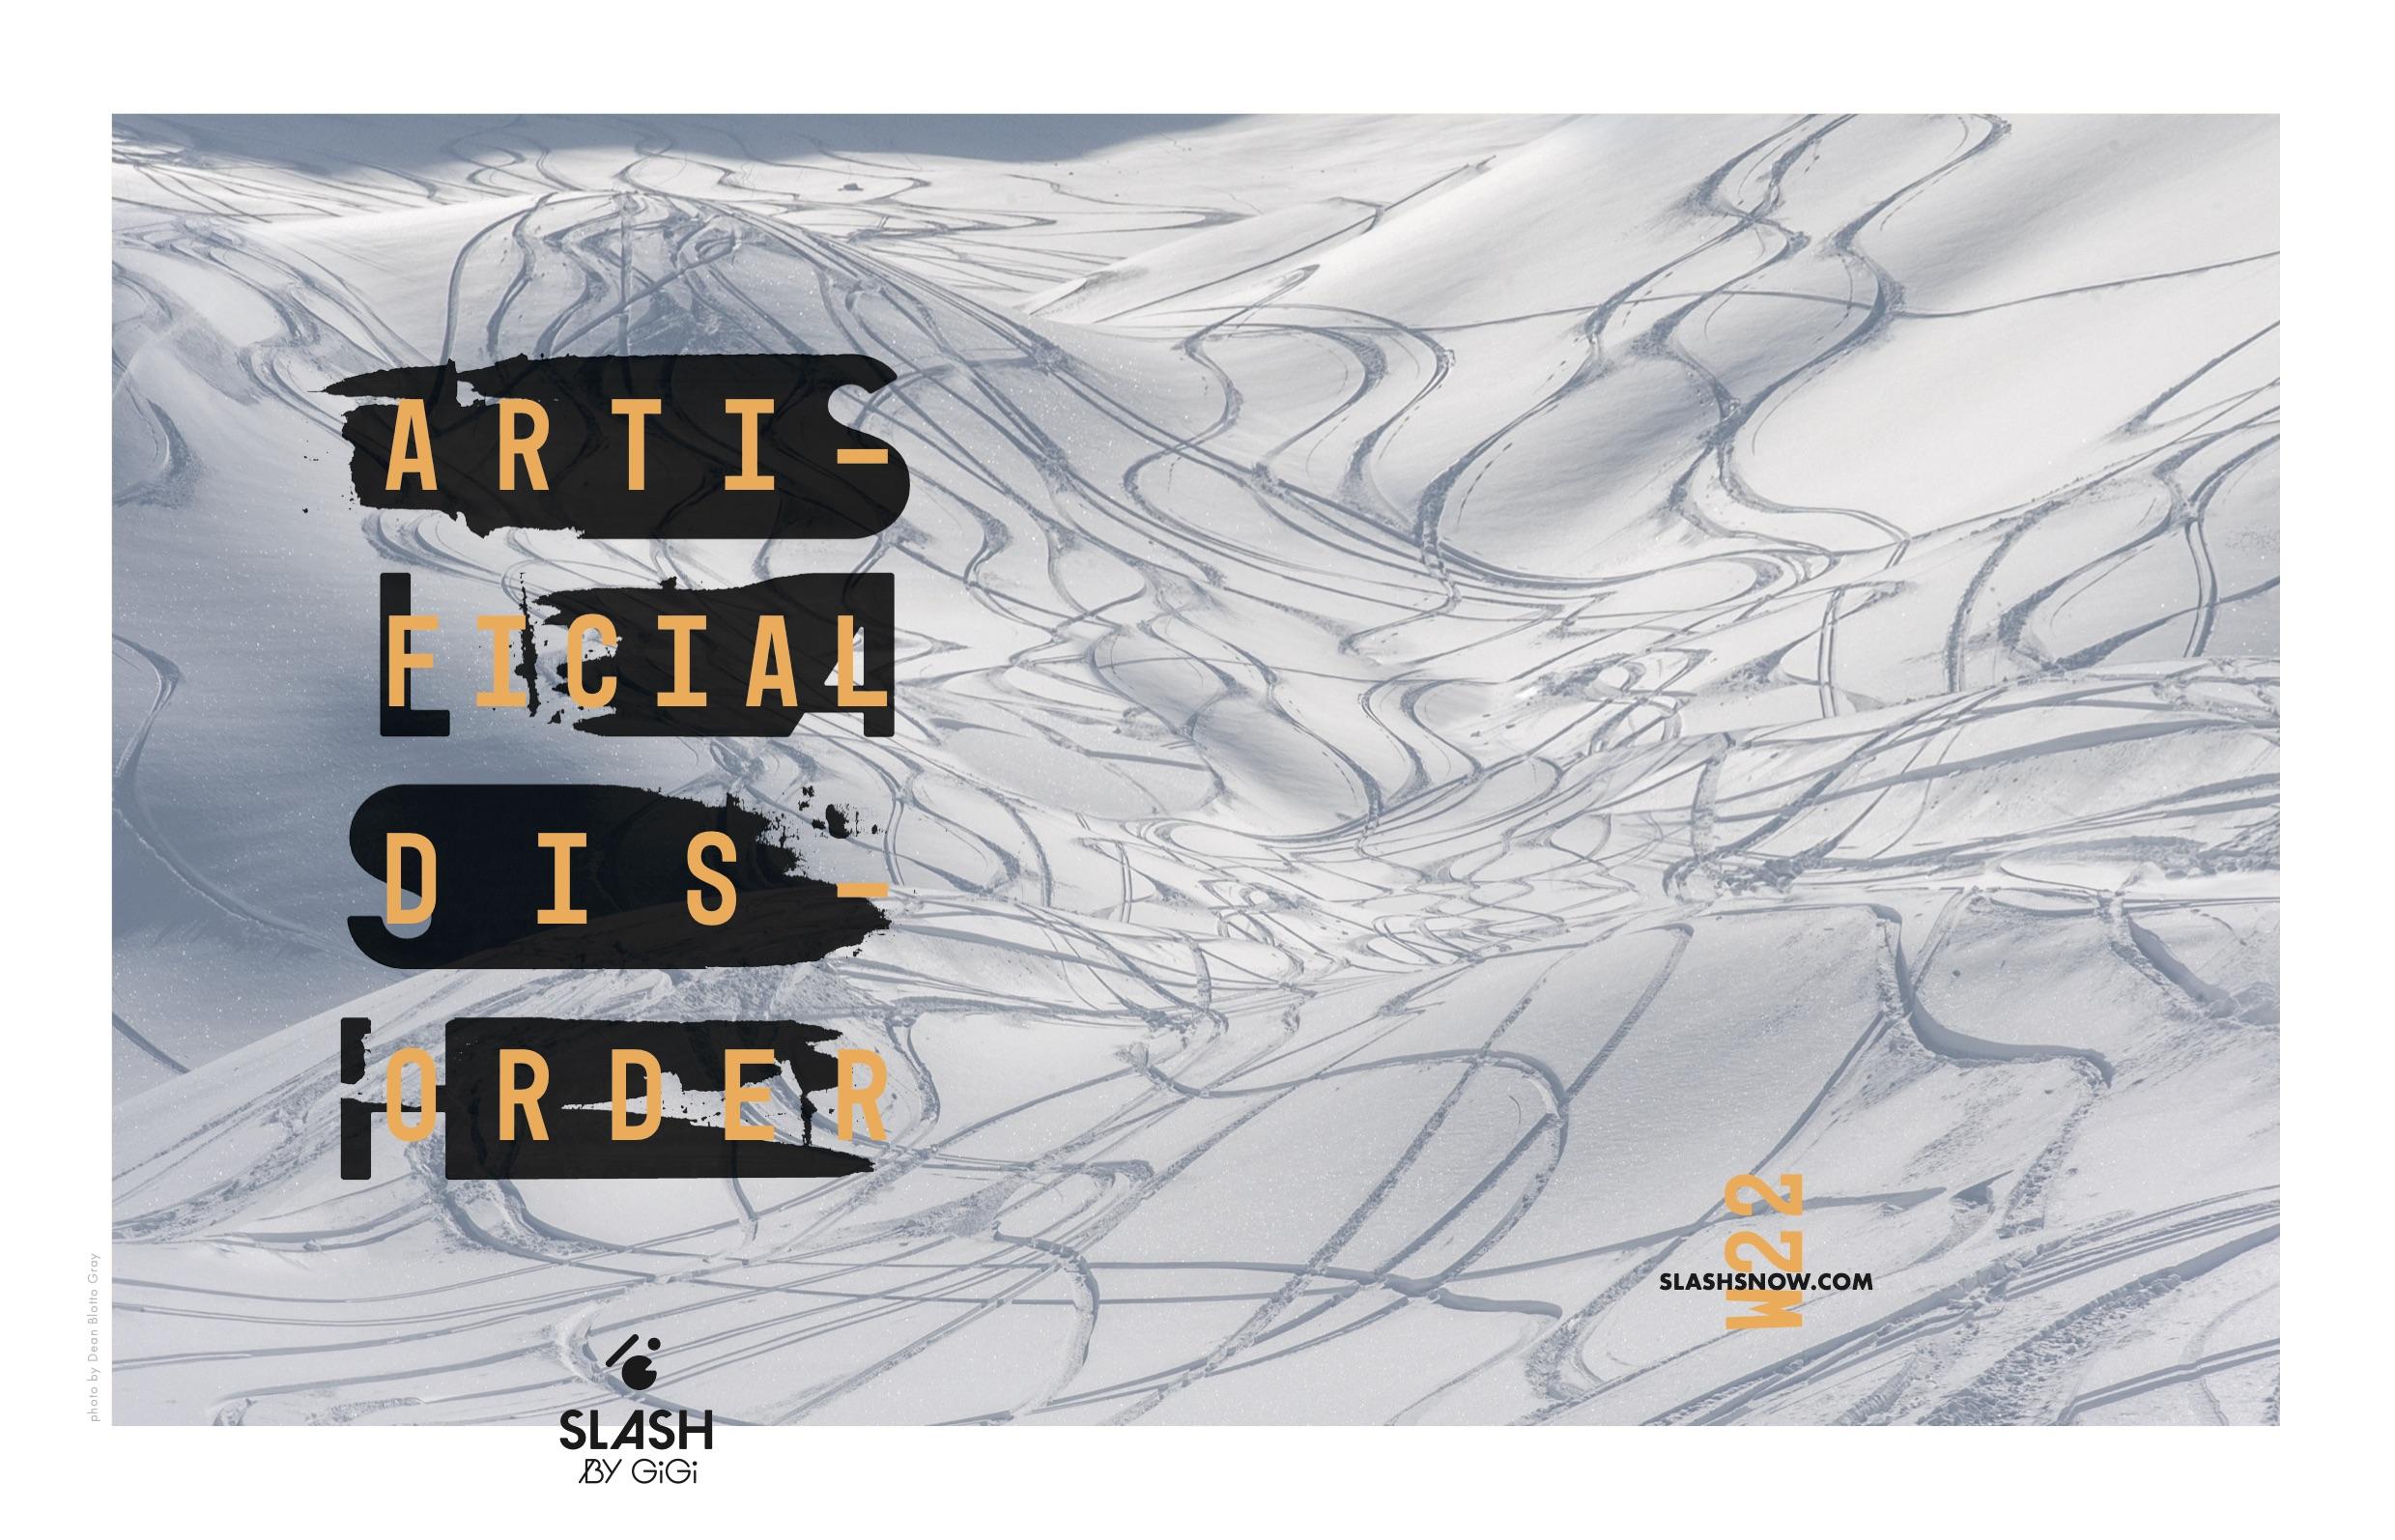 105 Slash snowboards